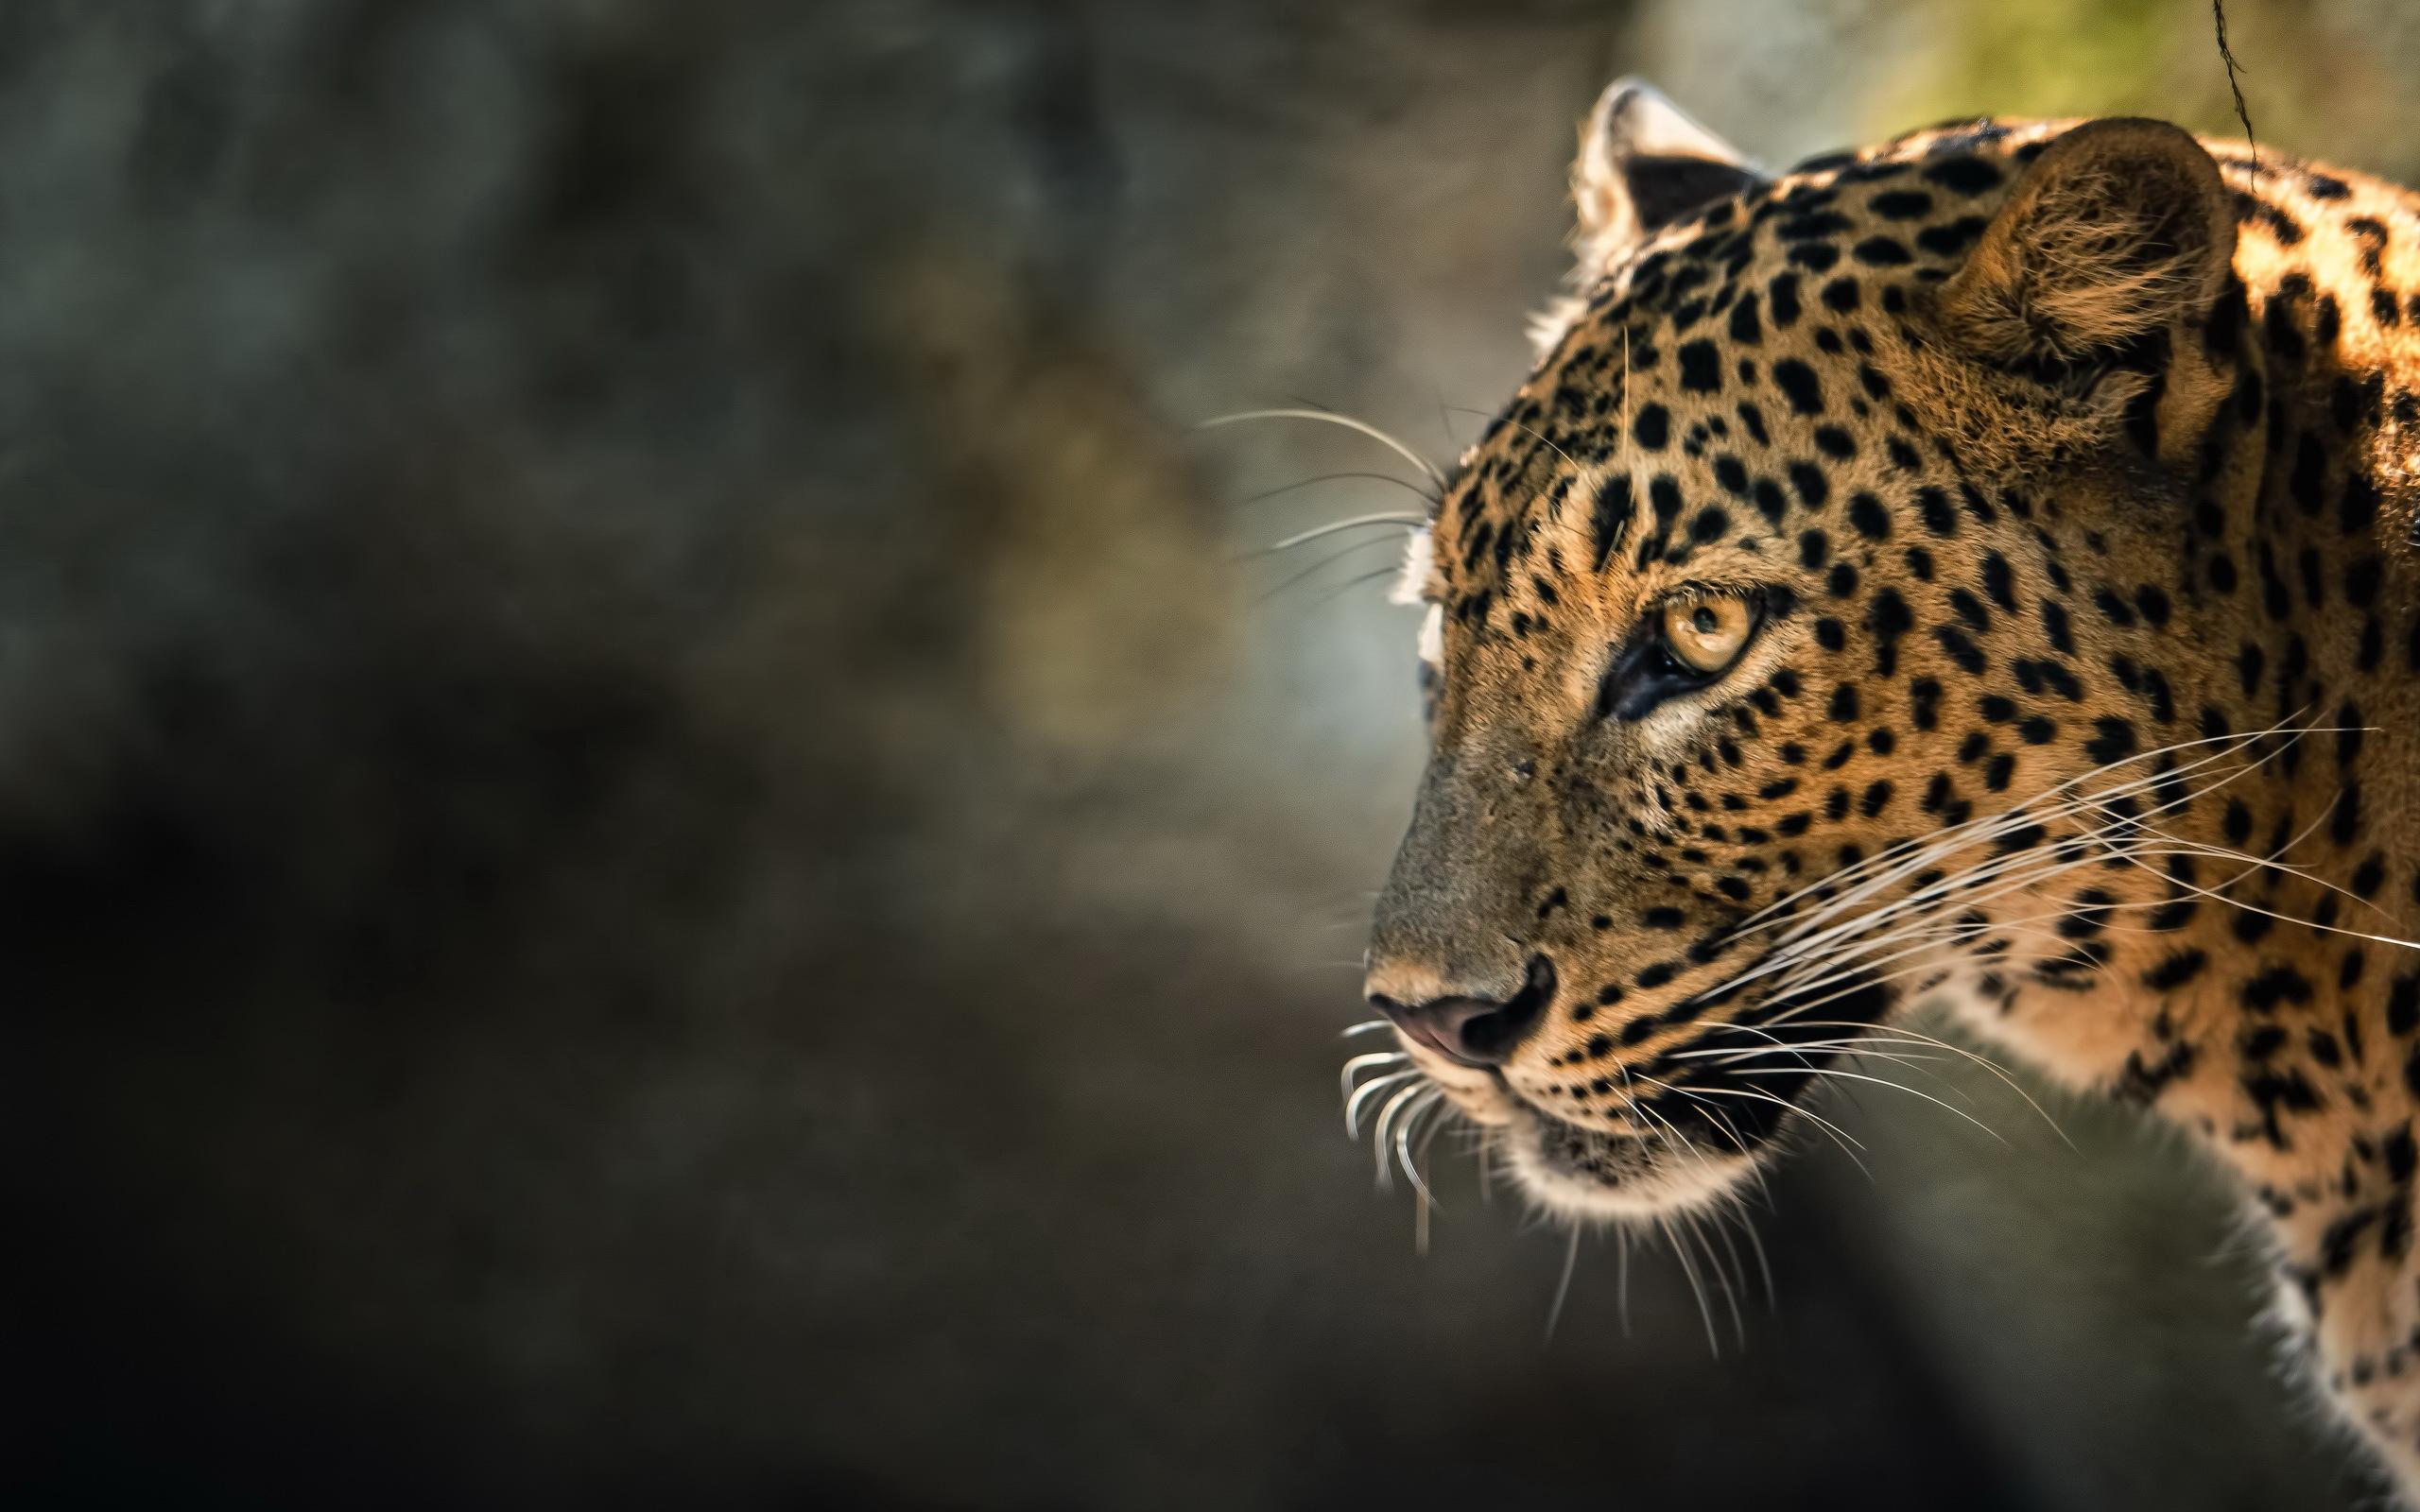 Leopard HD Wallpaper | Background Image | 2560x1600 | ID ...